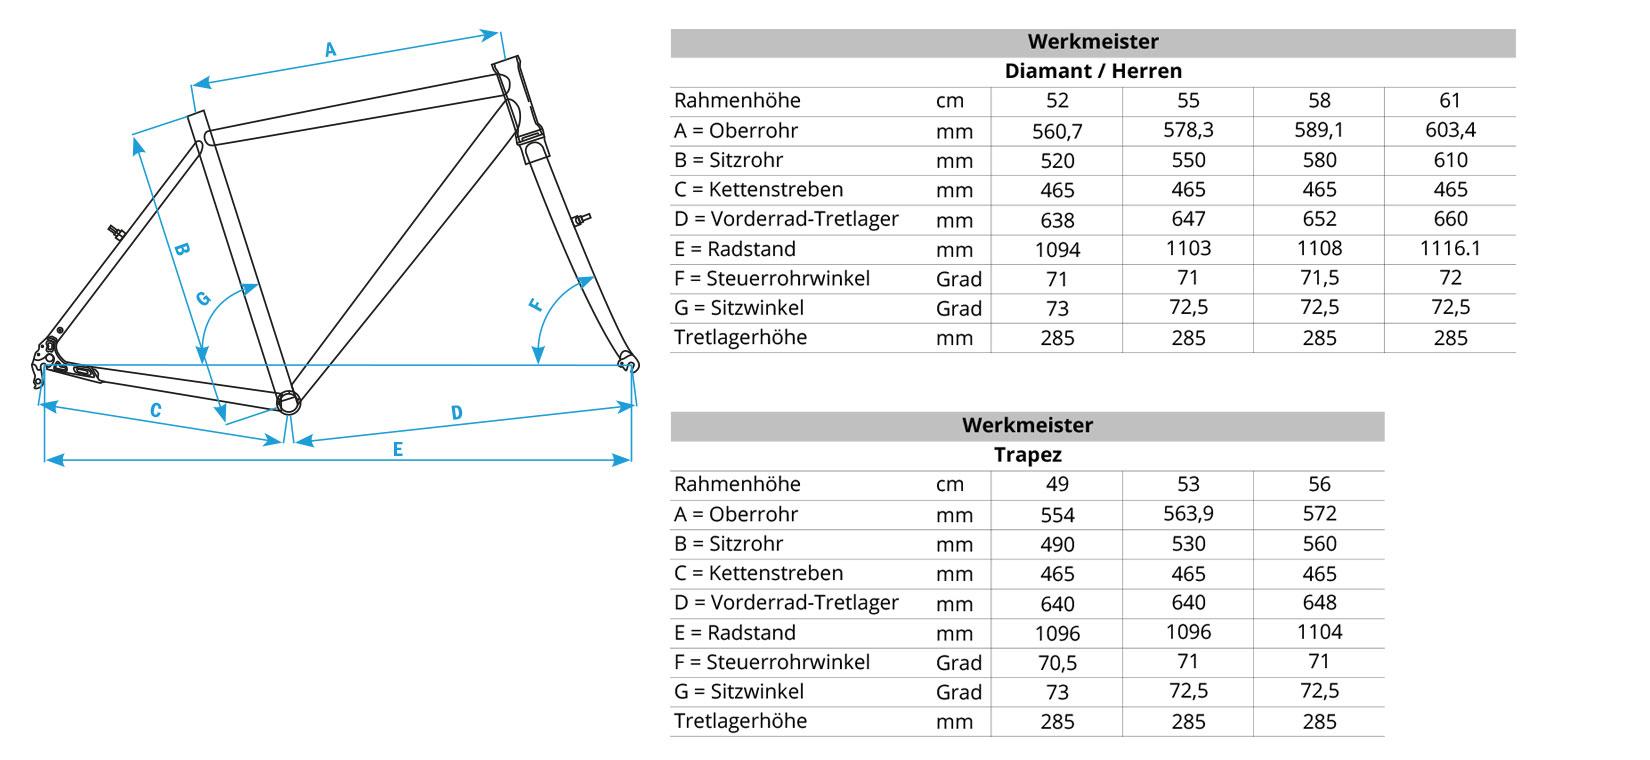 Geometriedaten Werkmeister